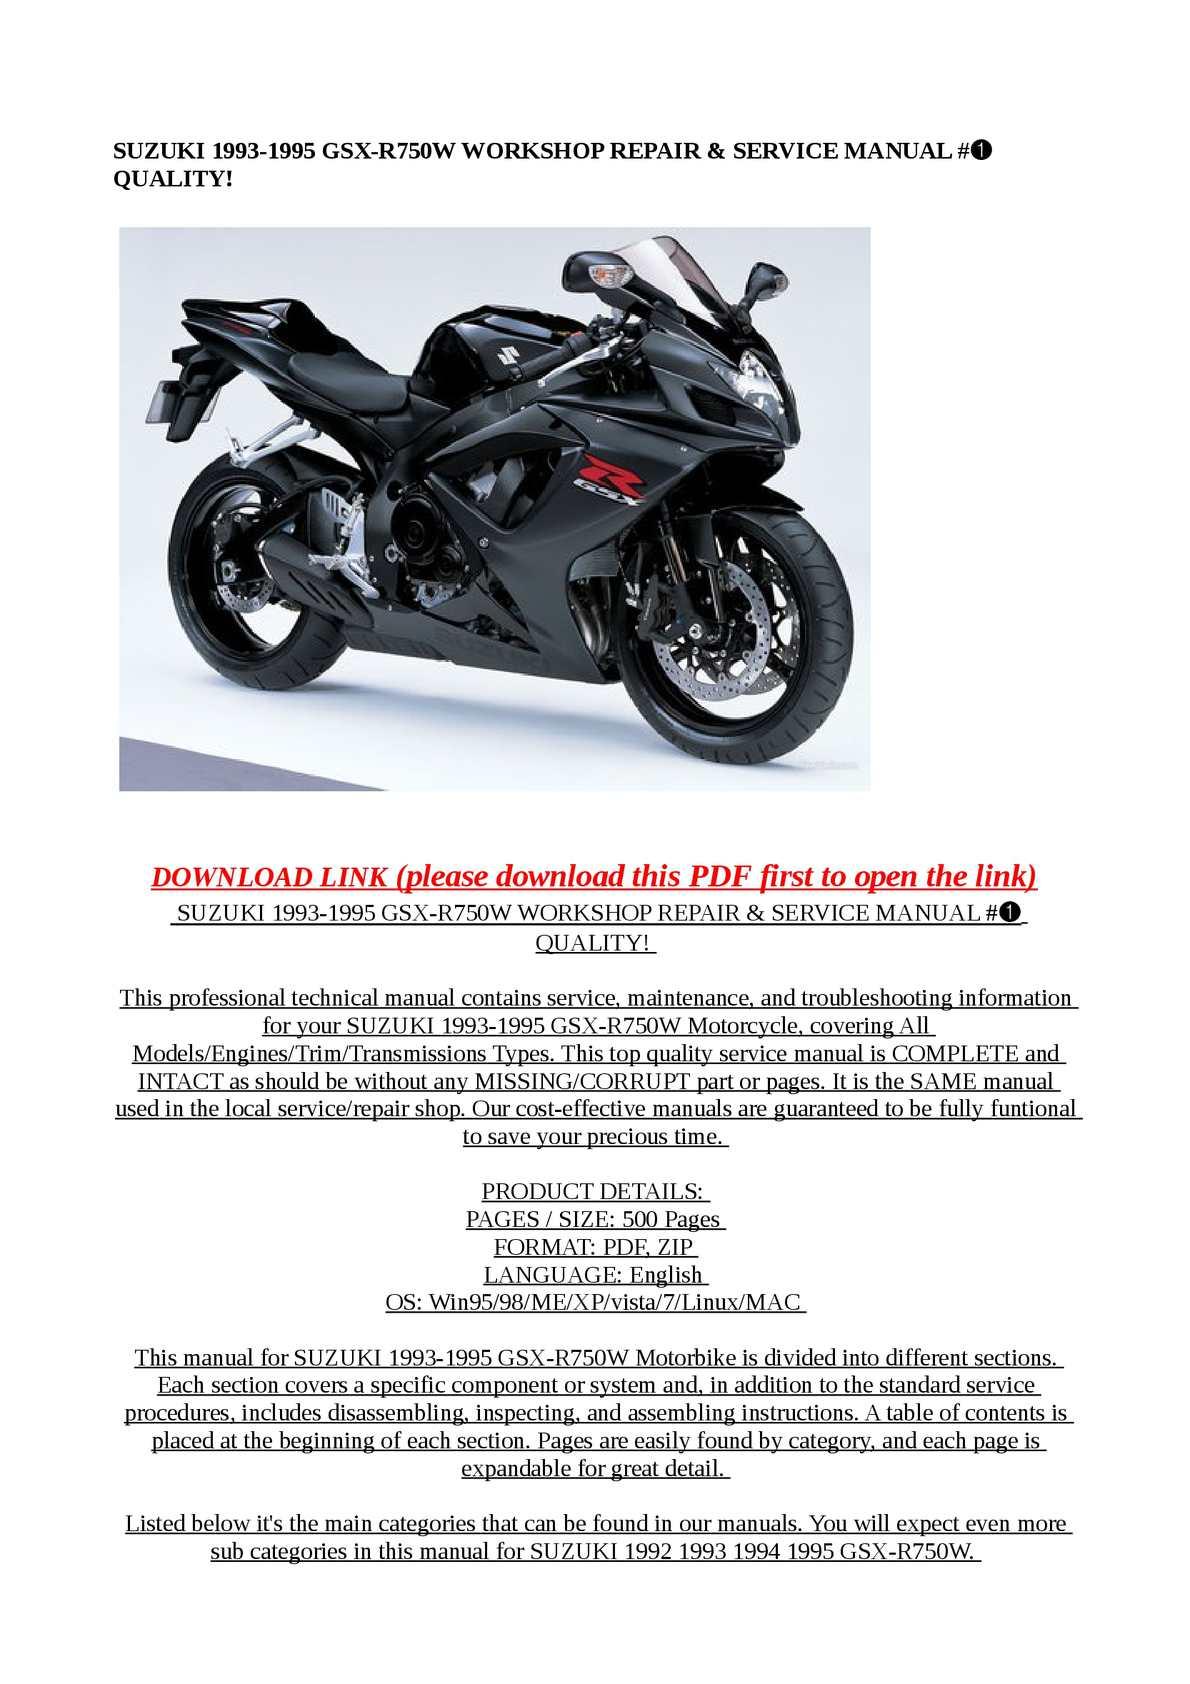 1993 1995 suzuki gsx r750w motorcycle service manual